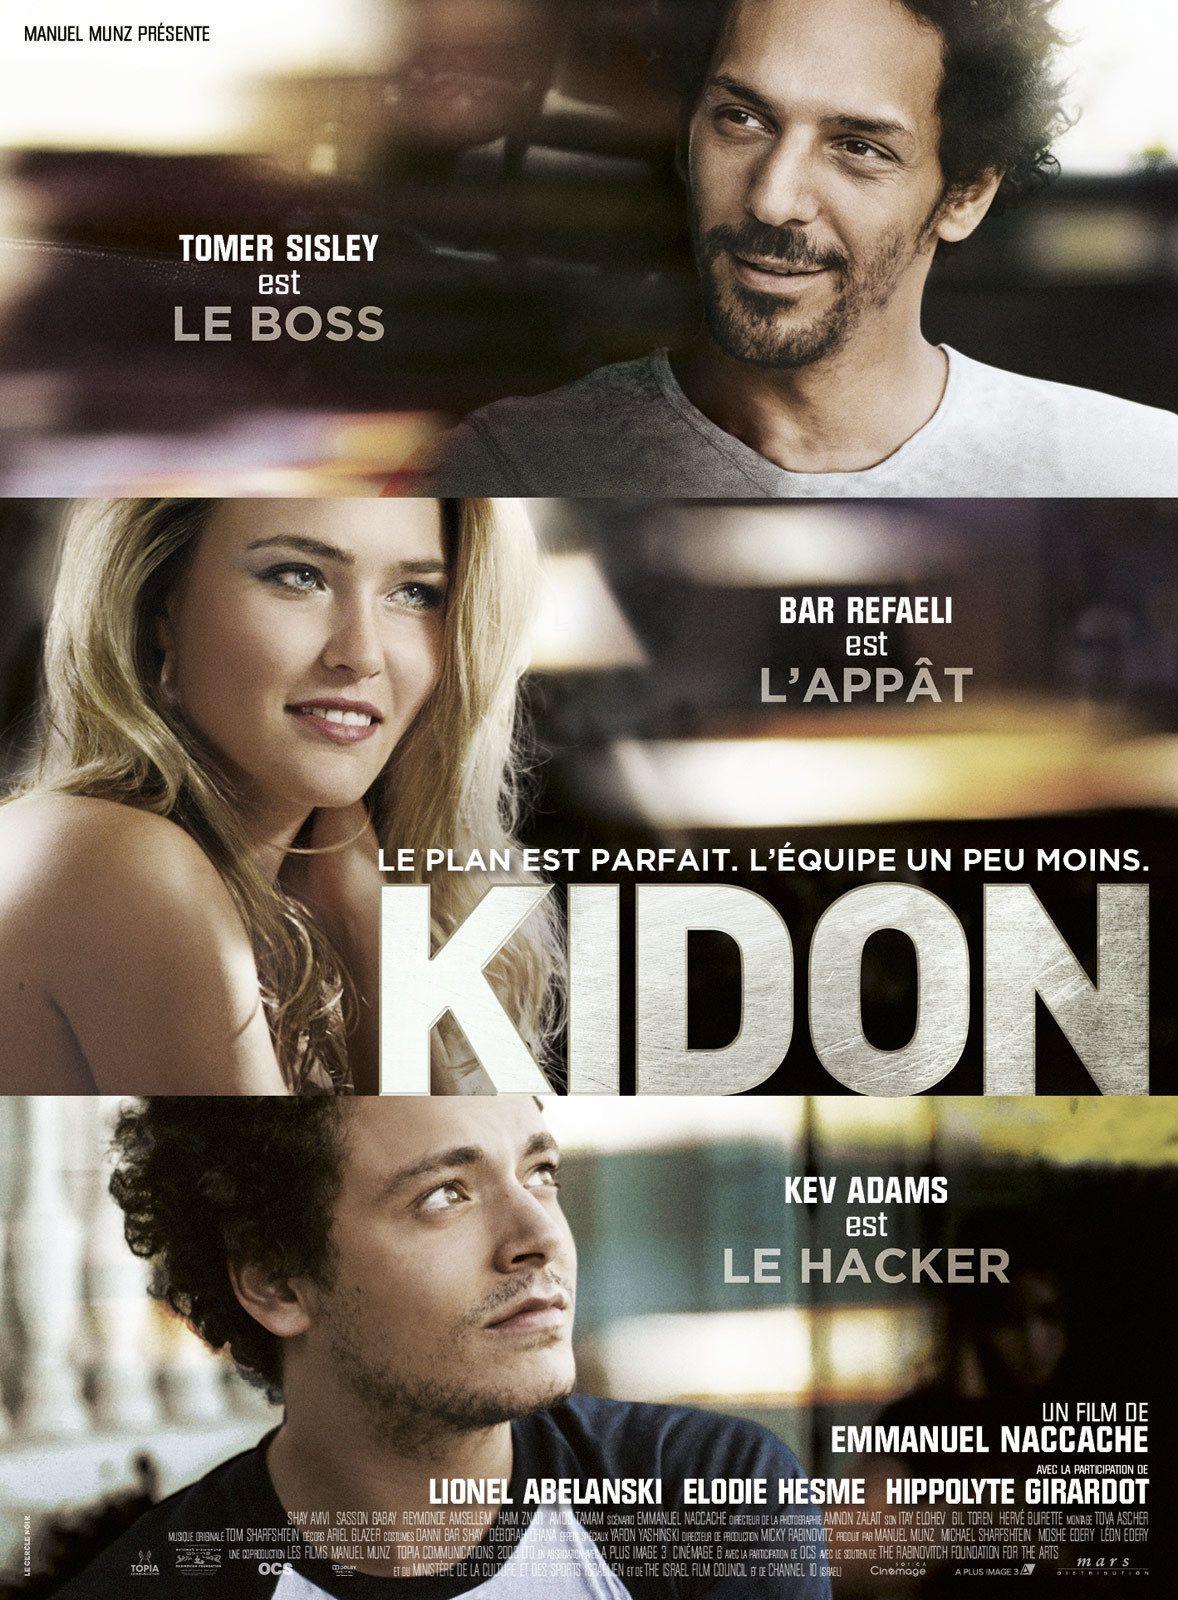 Kidon - Film (2014)